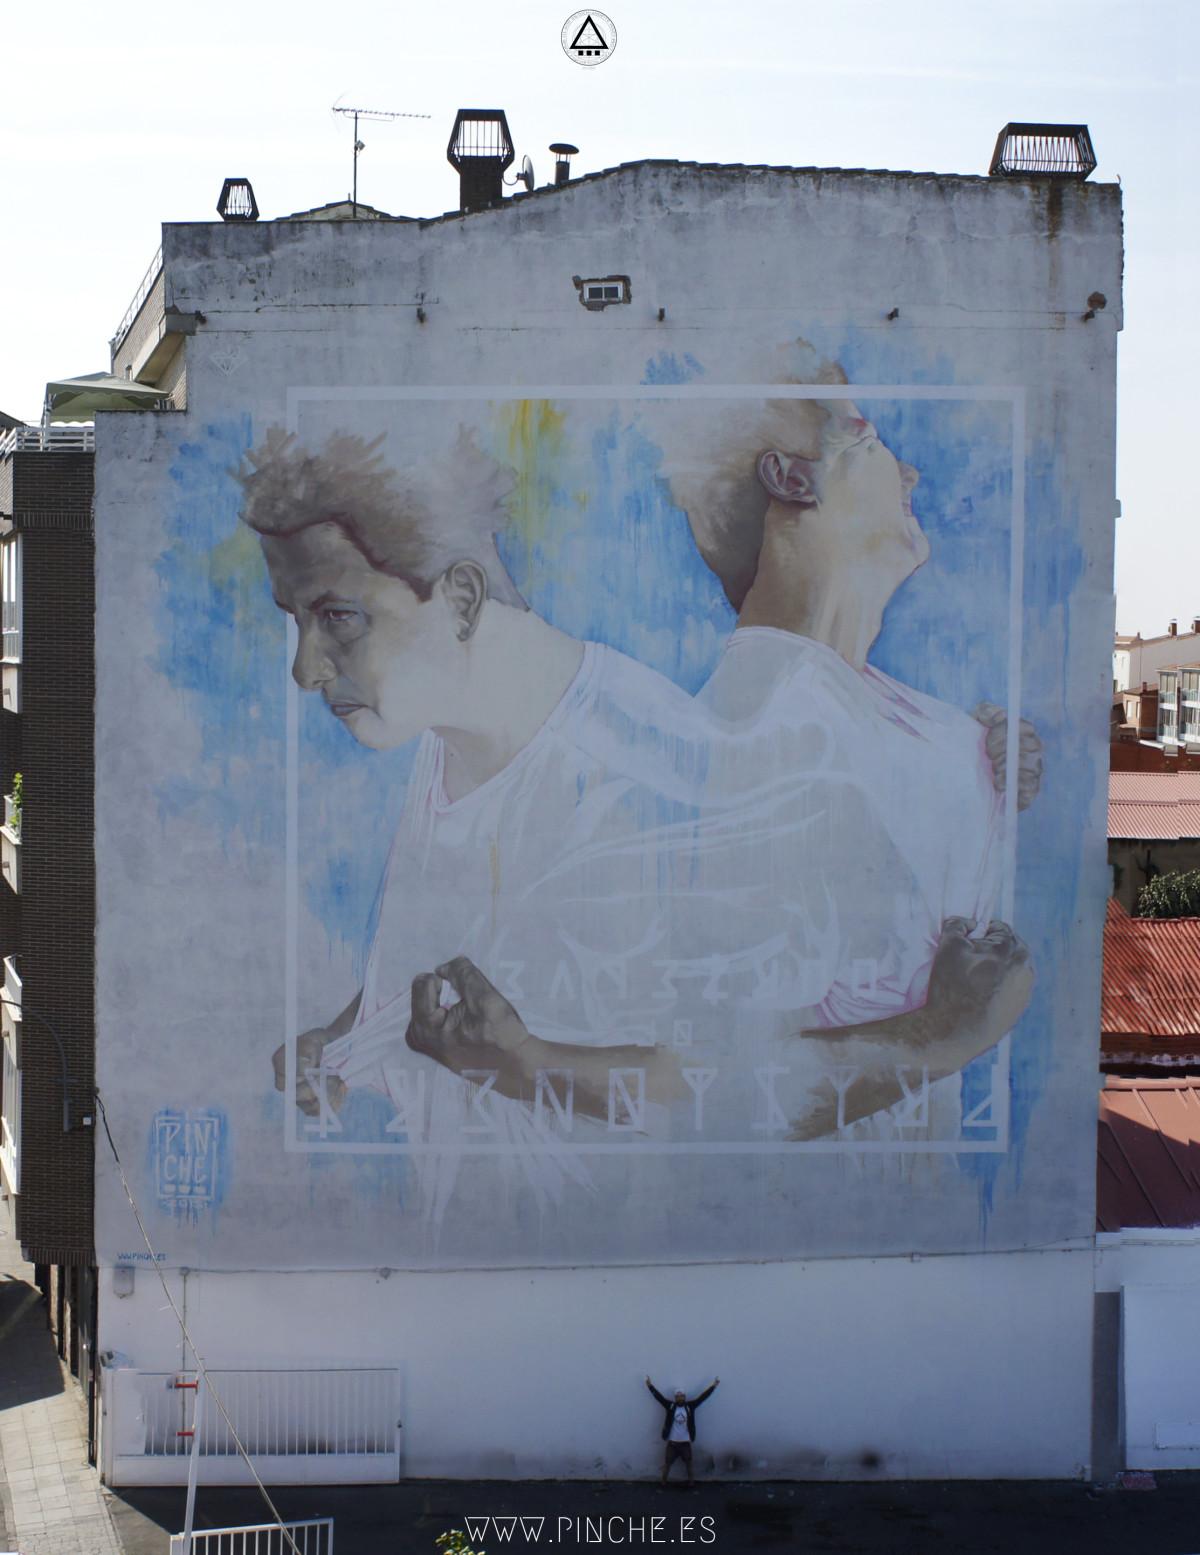 Graffiti en La Bañeza, León.